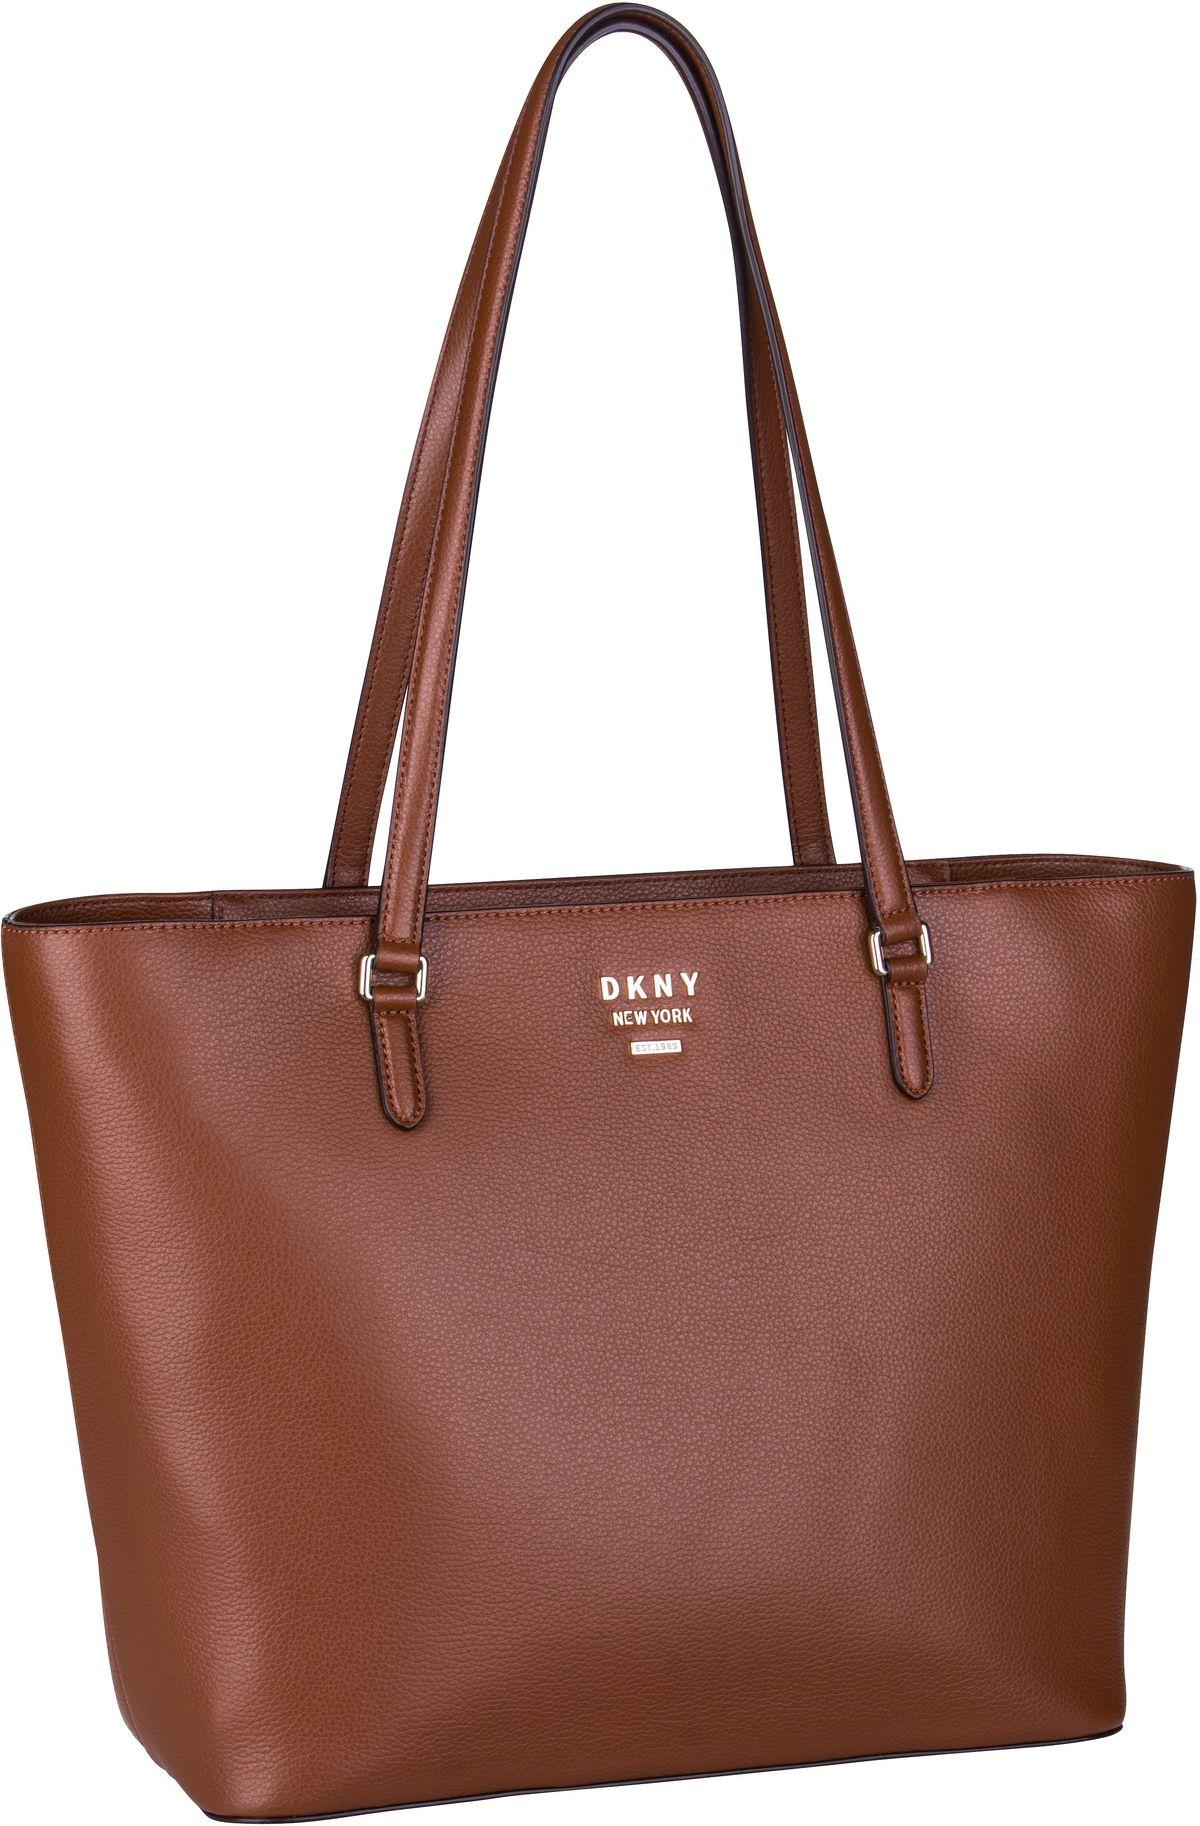 Shopper - DKNY Shopper Whitney Pebble Large Tote Caramel  - Onlineshop Taschenkaufhaus